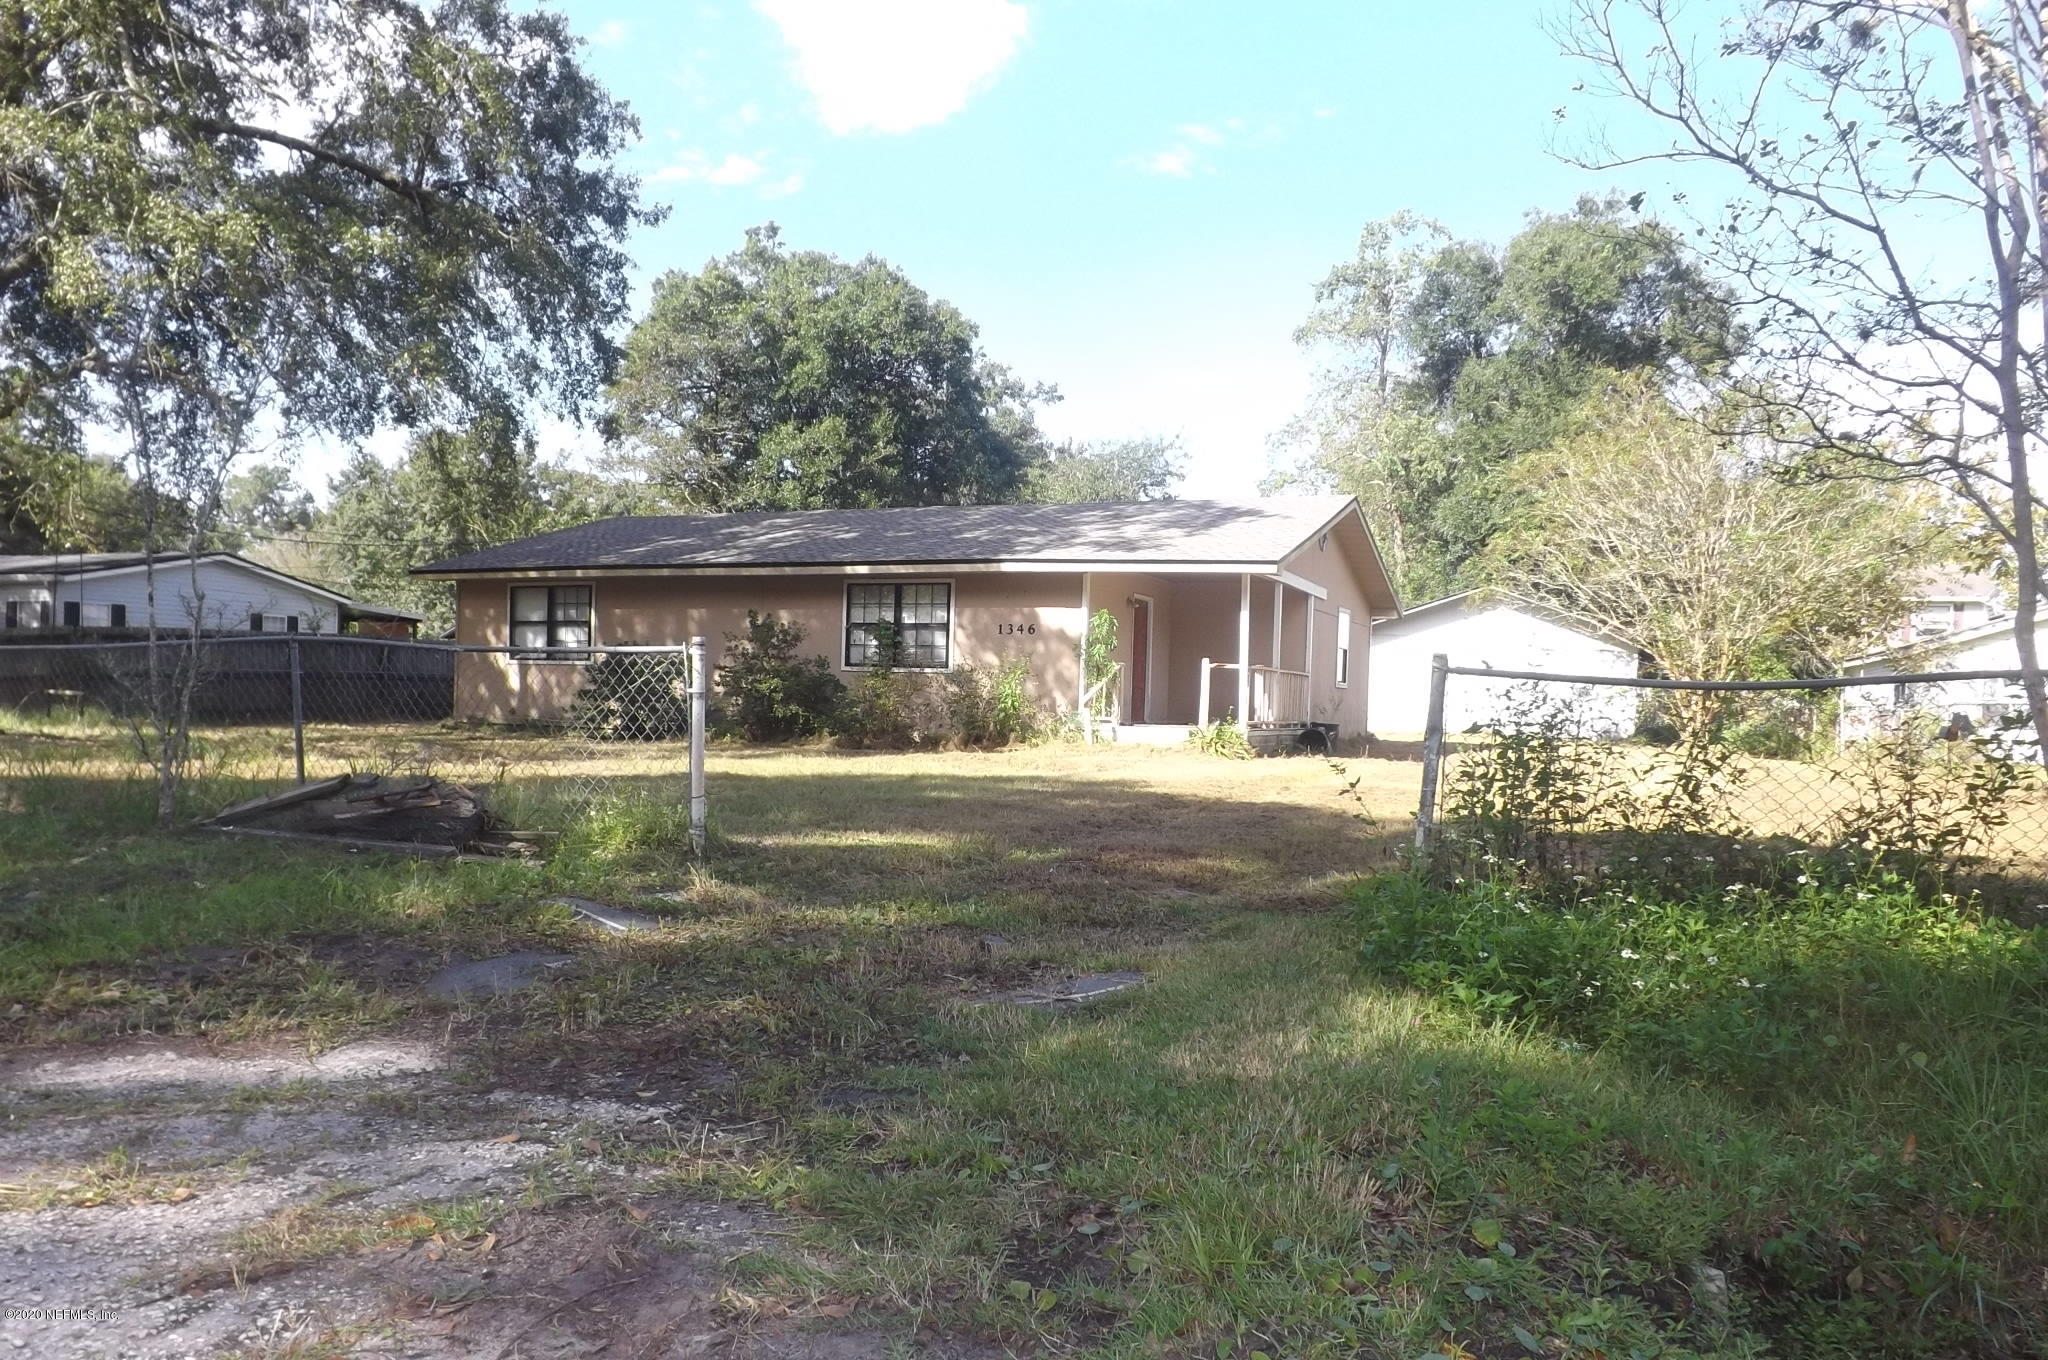 1346 CONWAY, JACKSONVILLE, FLORIDA 32221, 4 Bedrooms Bedrooms, ,2 BathroomsBathrooms,Residential,For sale,CONWAY,1073126